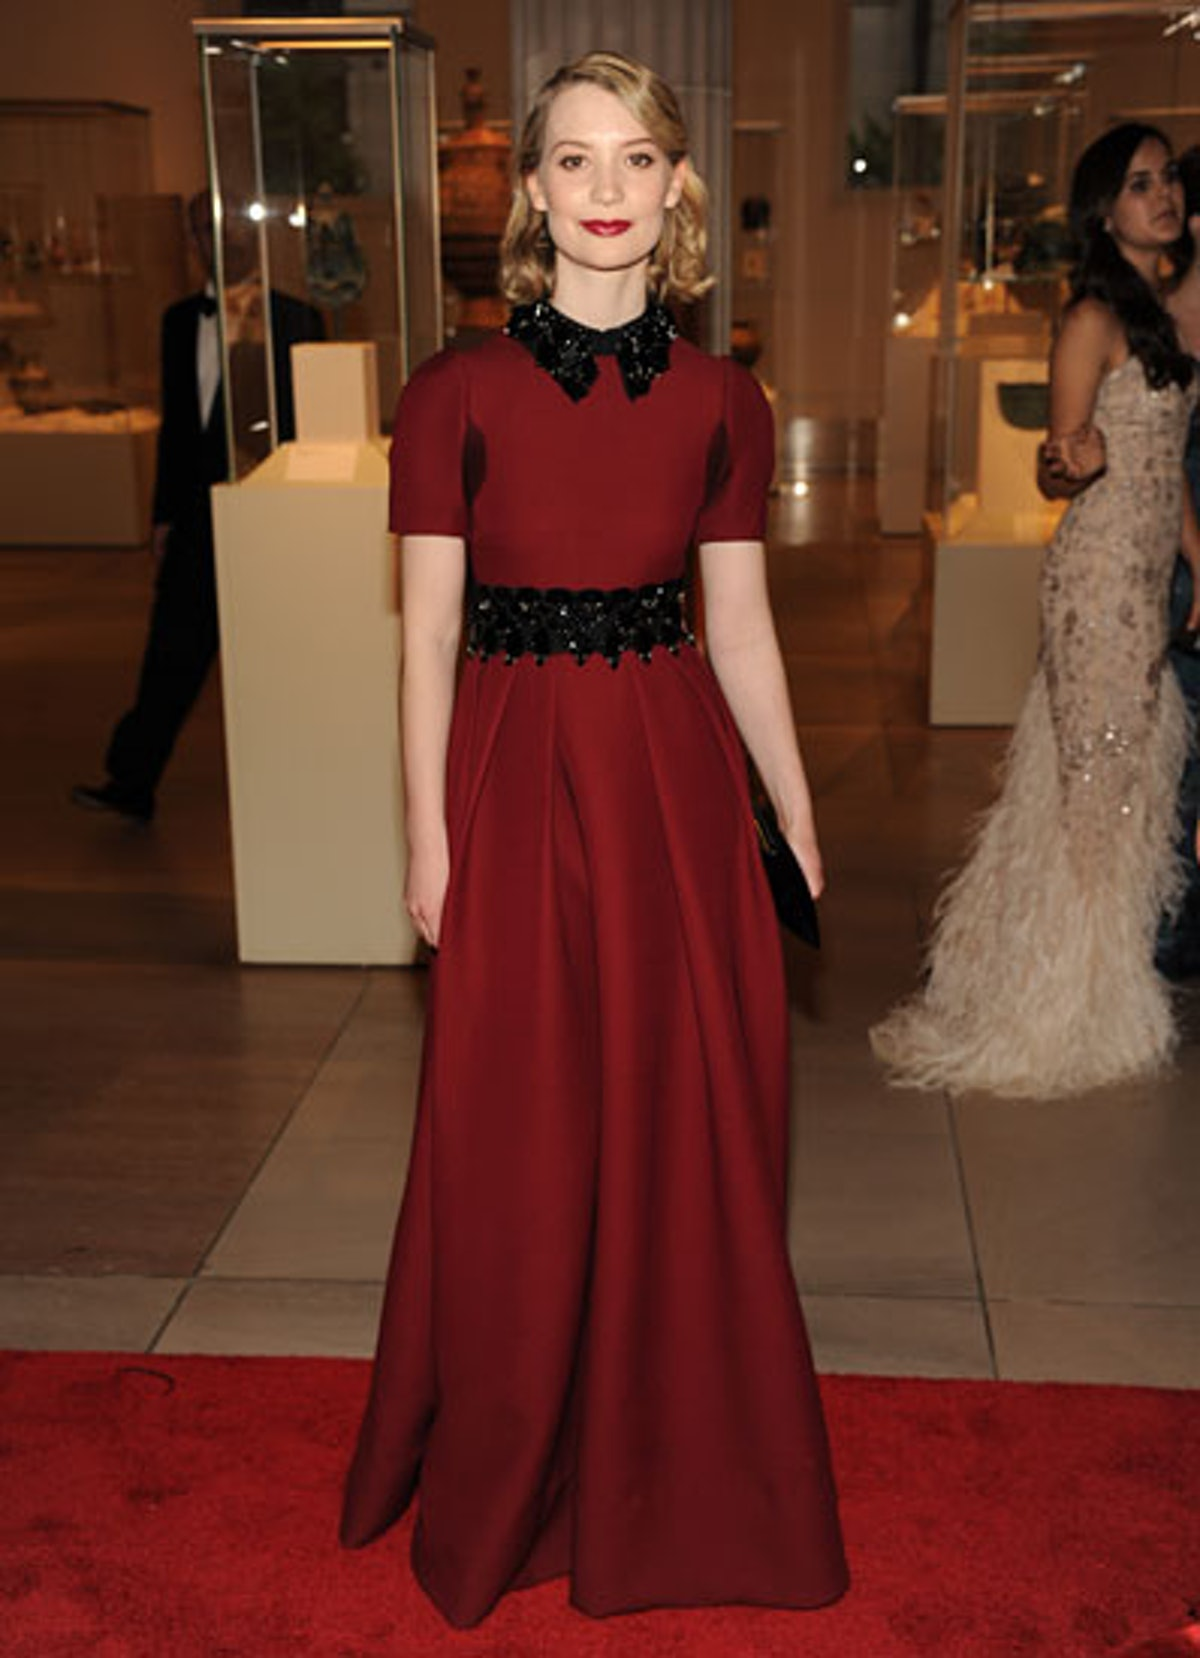 cess-mia-wasikowska-red-carpet-lookbook-09-v.jpg